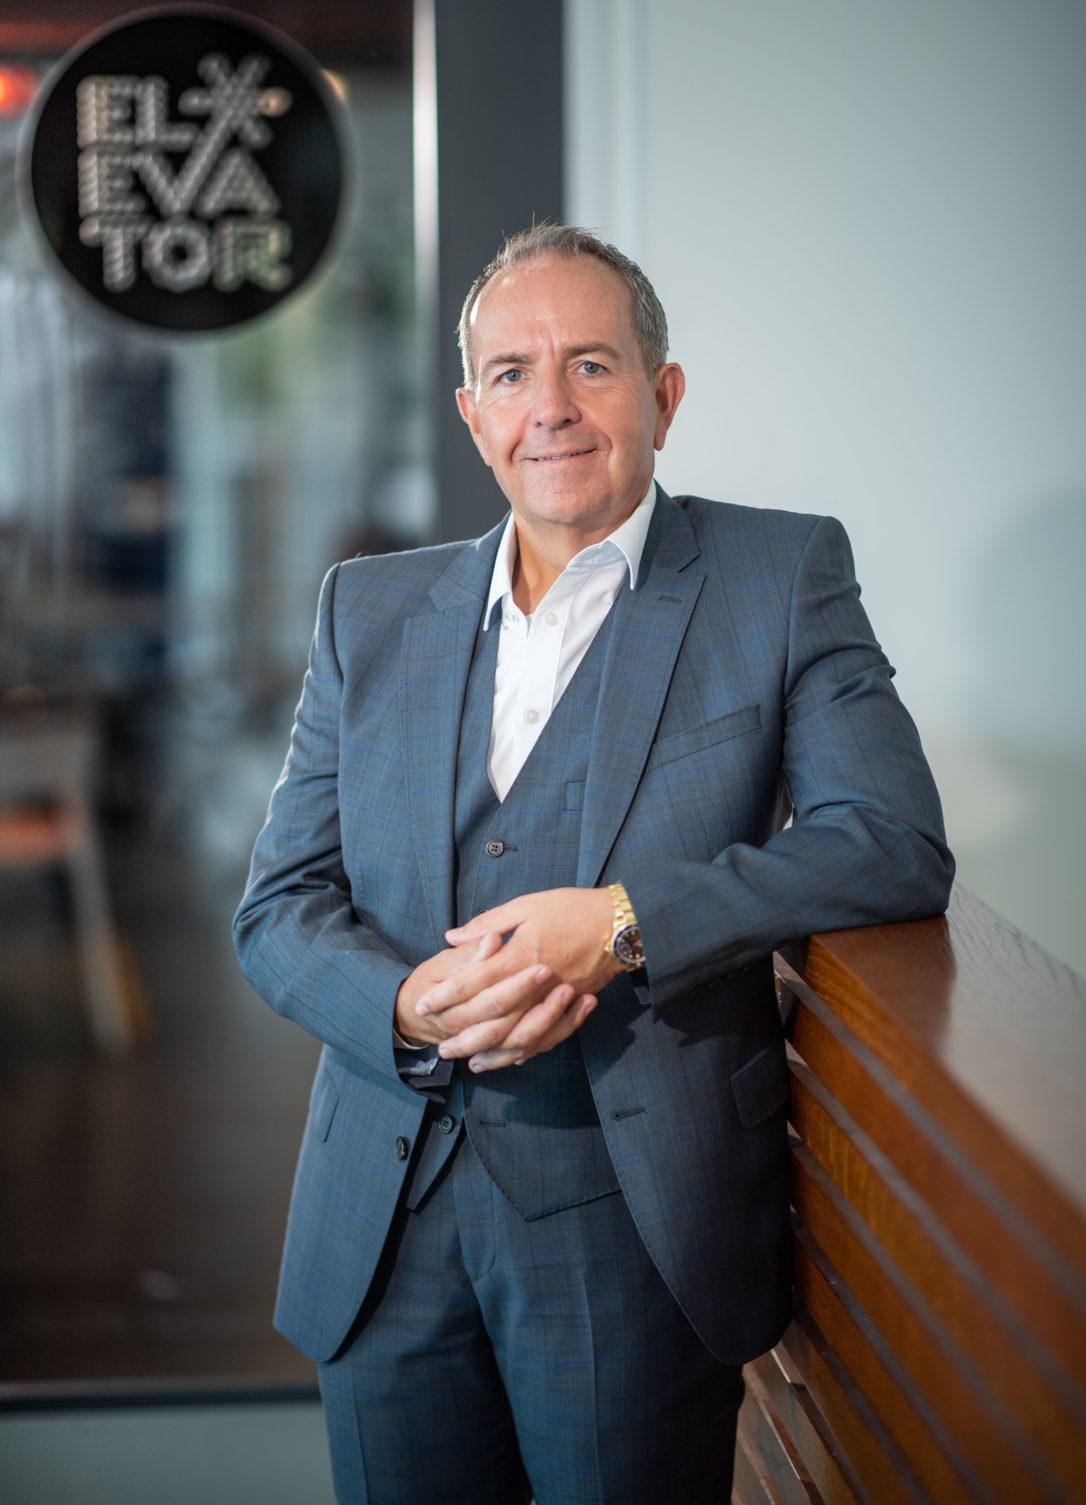 Gary McEwen, Elevator CEO